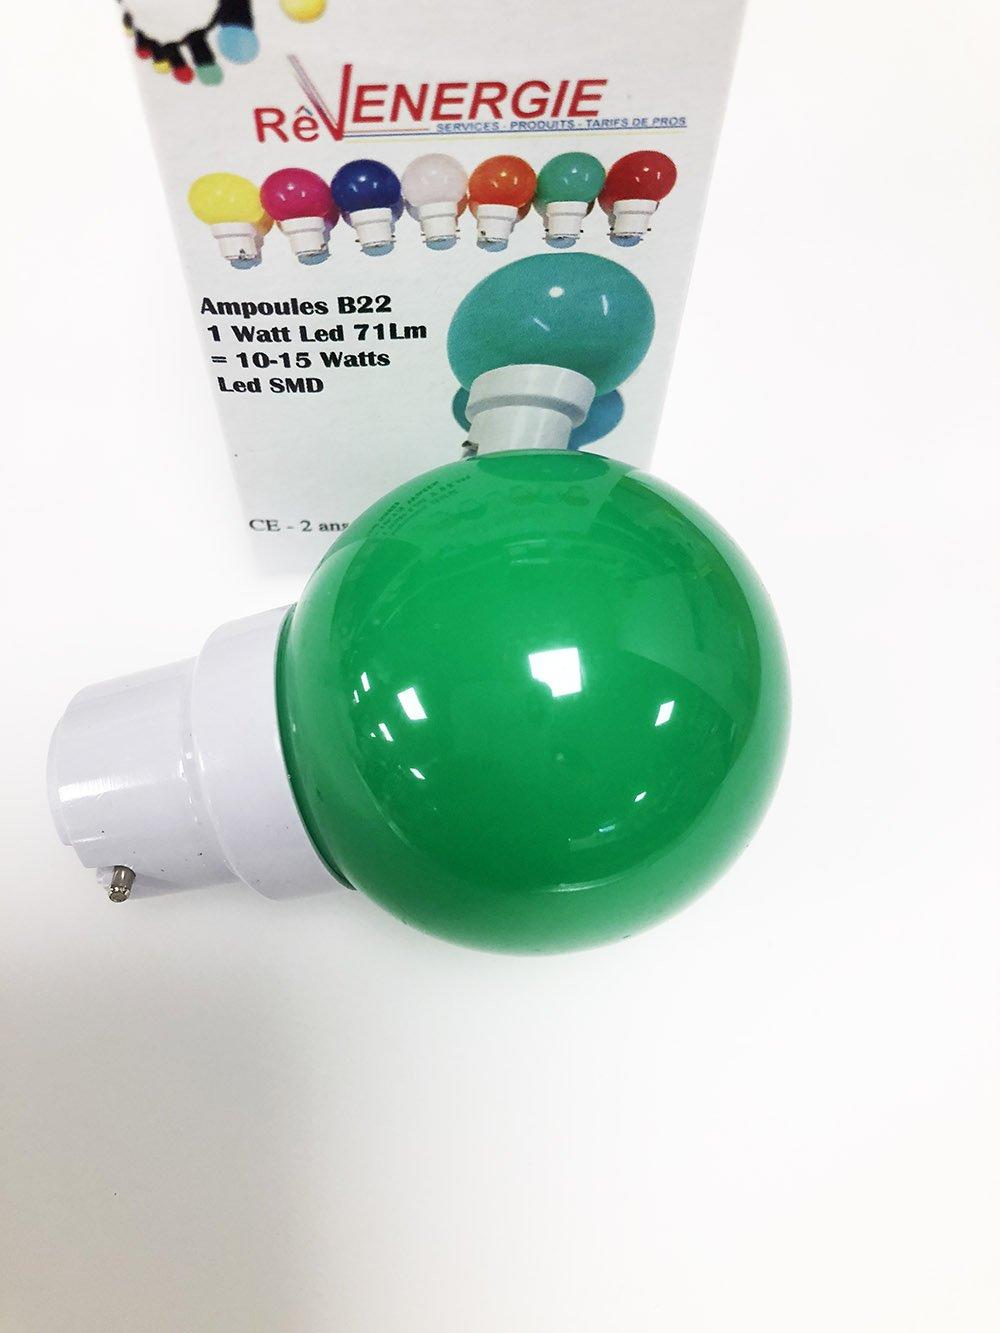 Lote de 6 bombillas LED B22 1 W color rojo, azul, verde, amarillo, rosa, naranja, irrompibles, equivalentes a 15 W, para guirnalda exterior: Amazon.es: ...